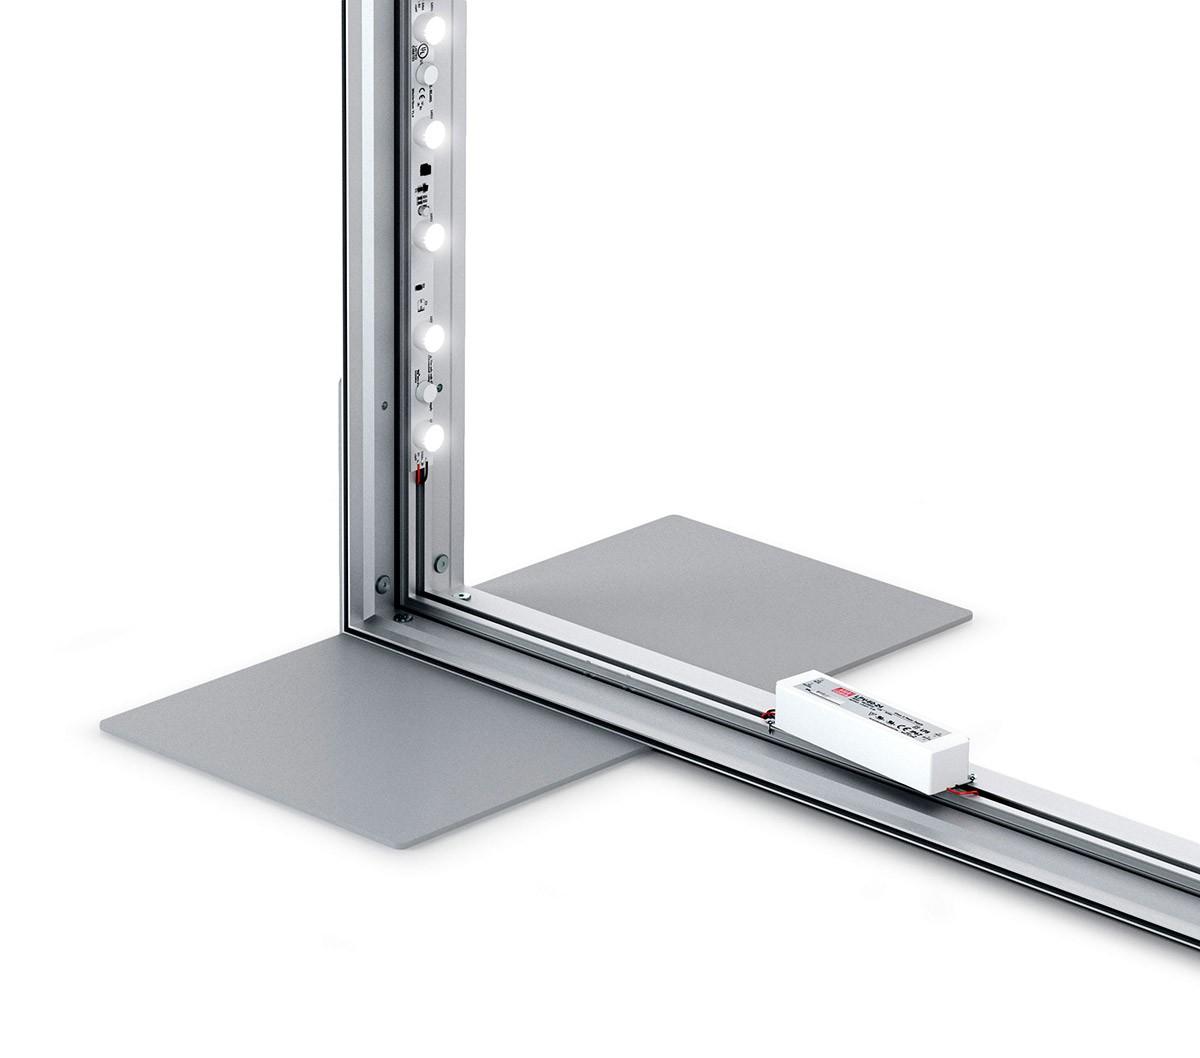 Charisma 120x90 Double Sided LED SEG Fabric Light Box